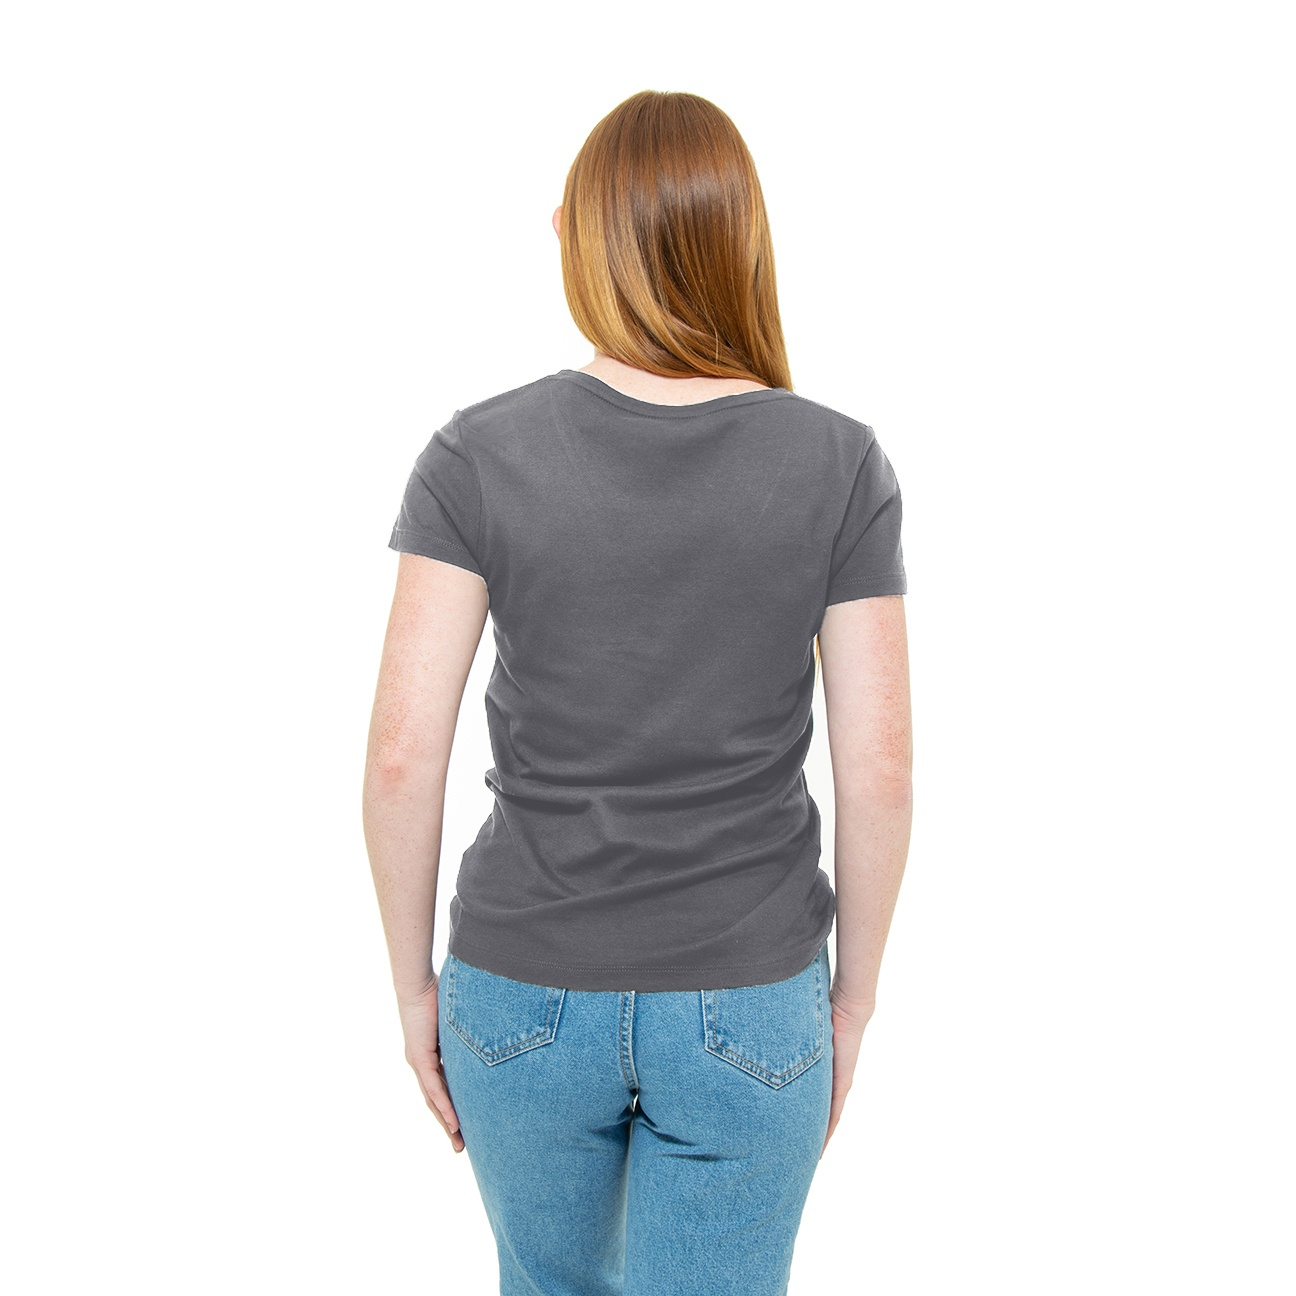 Franela basica gris cuello en V damas espaldas